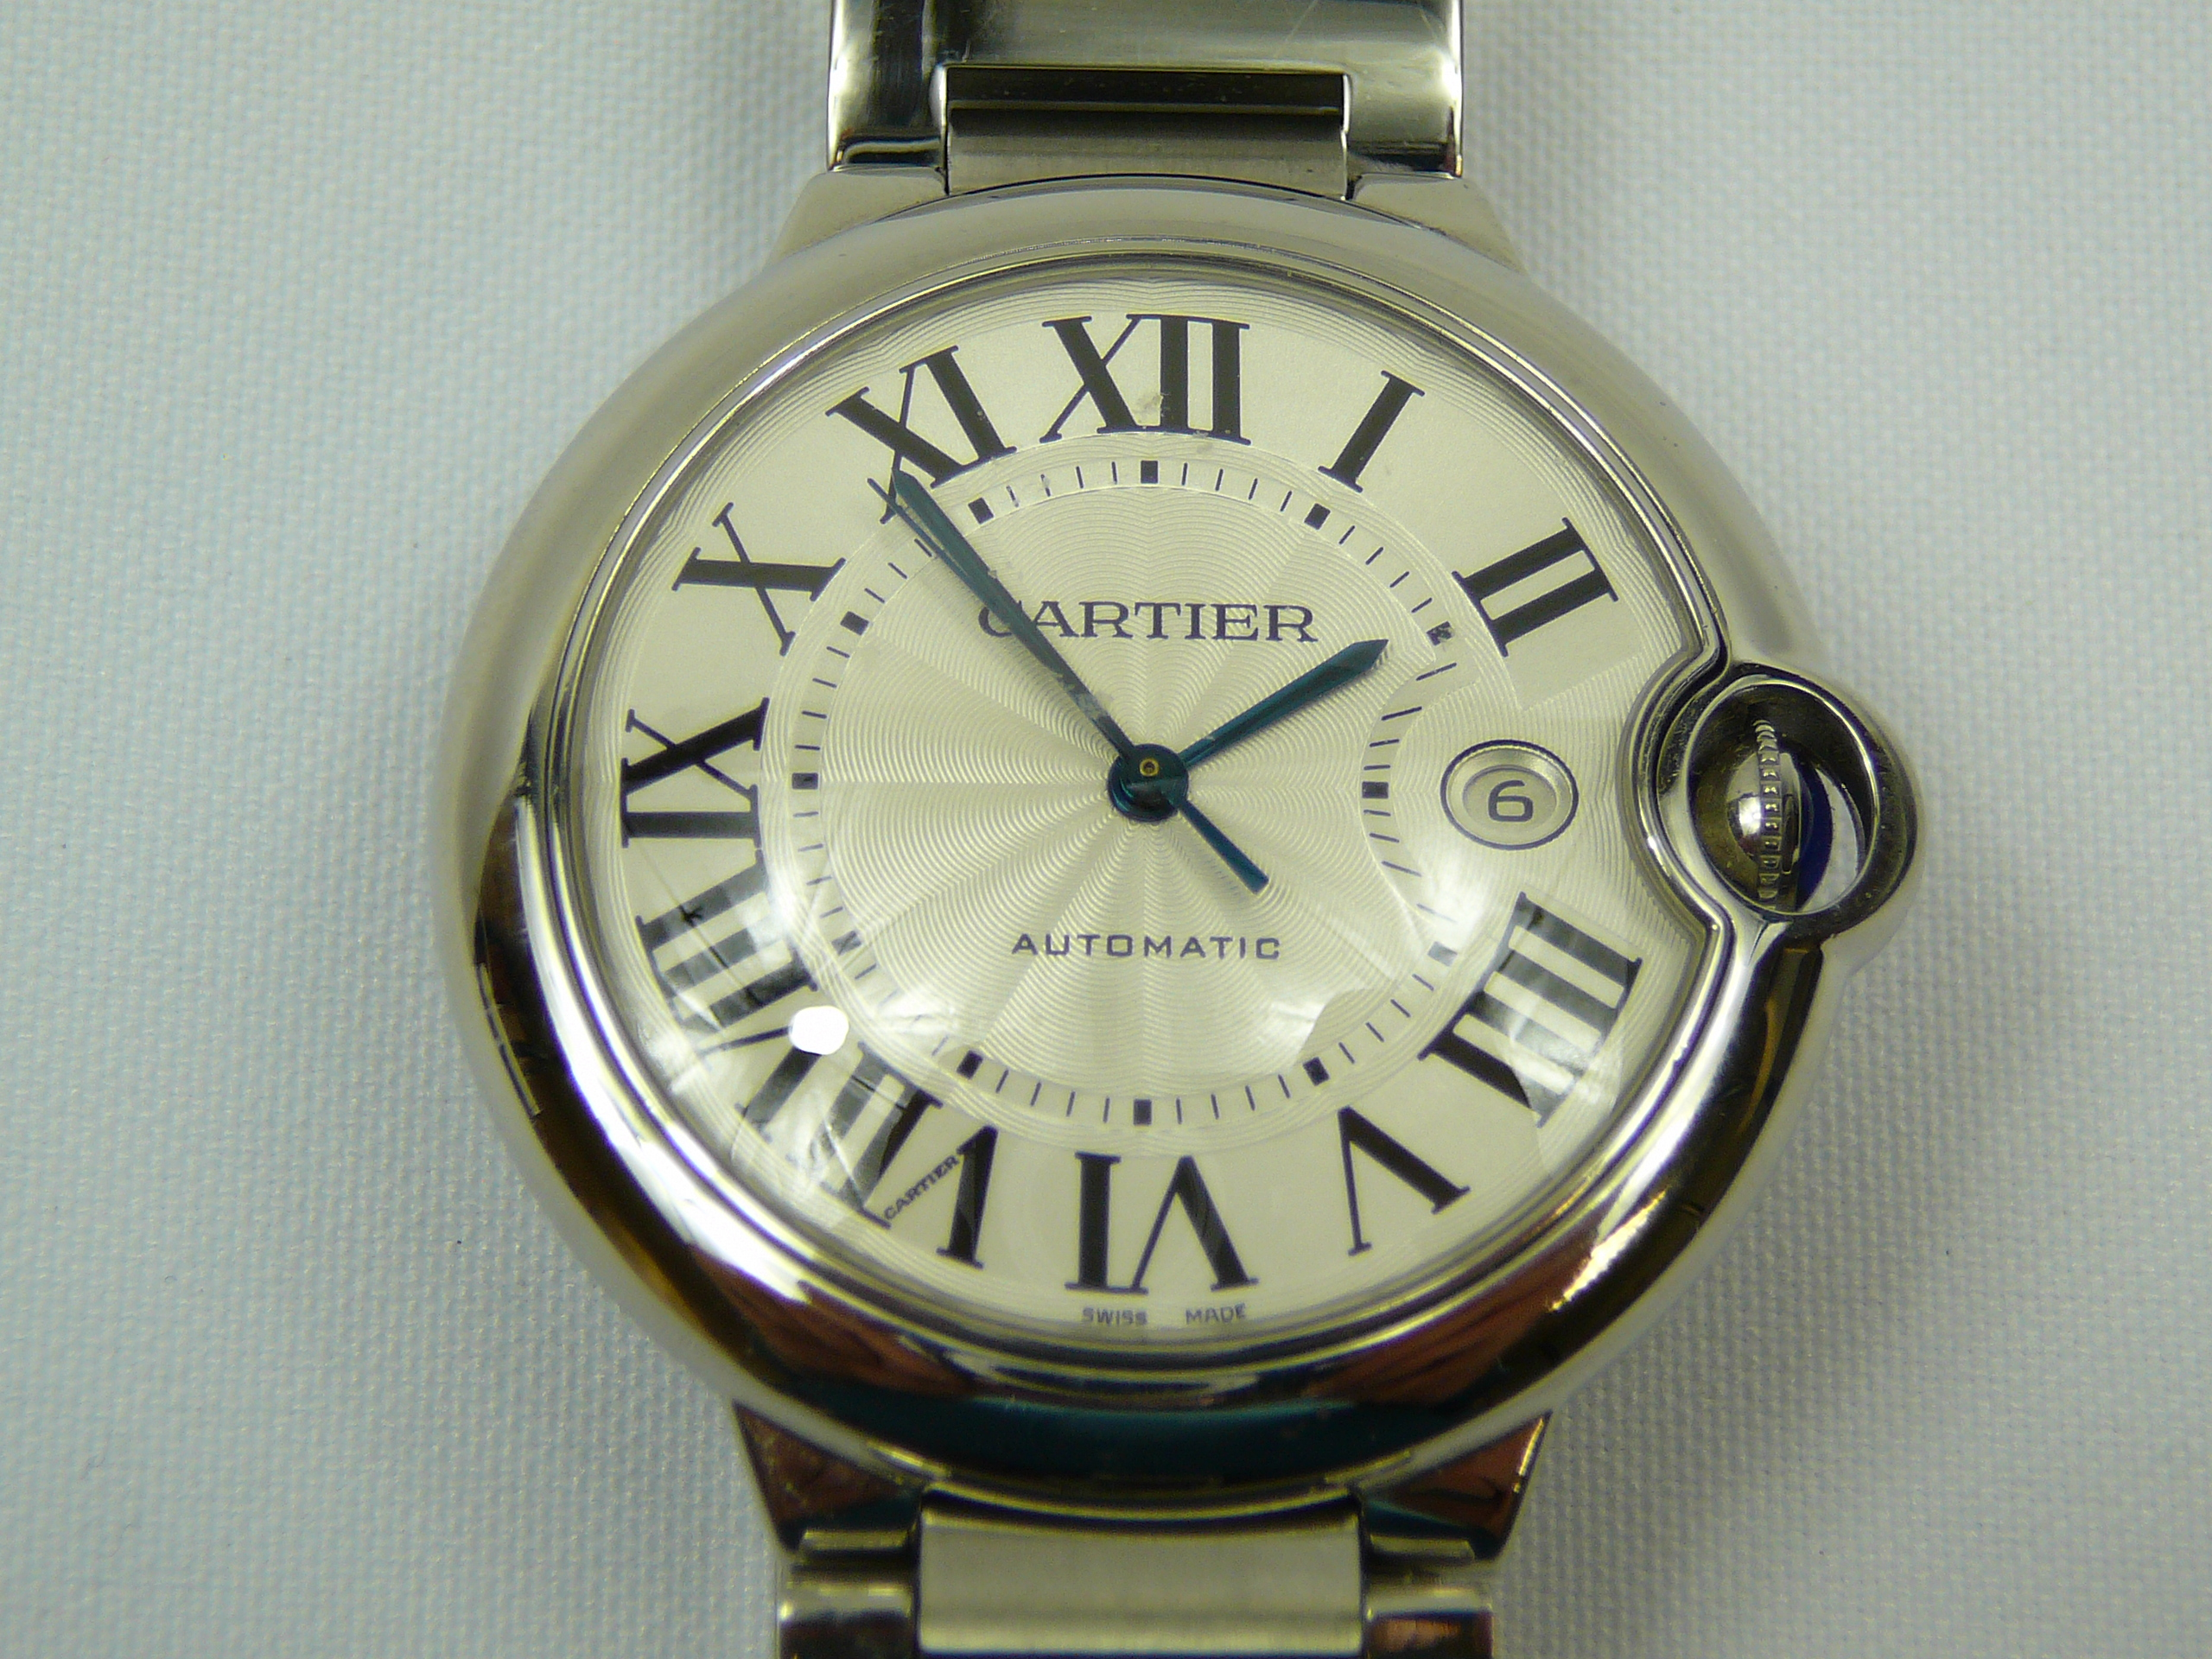 Lot 19 - Gents Cartier Wrist Watch